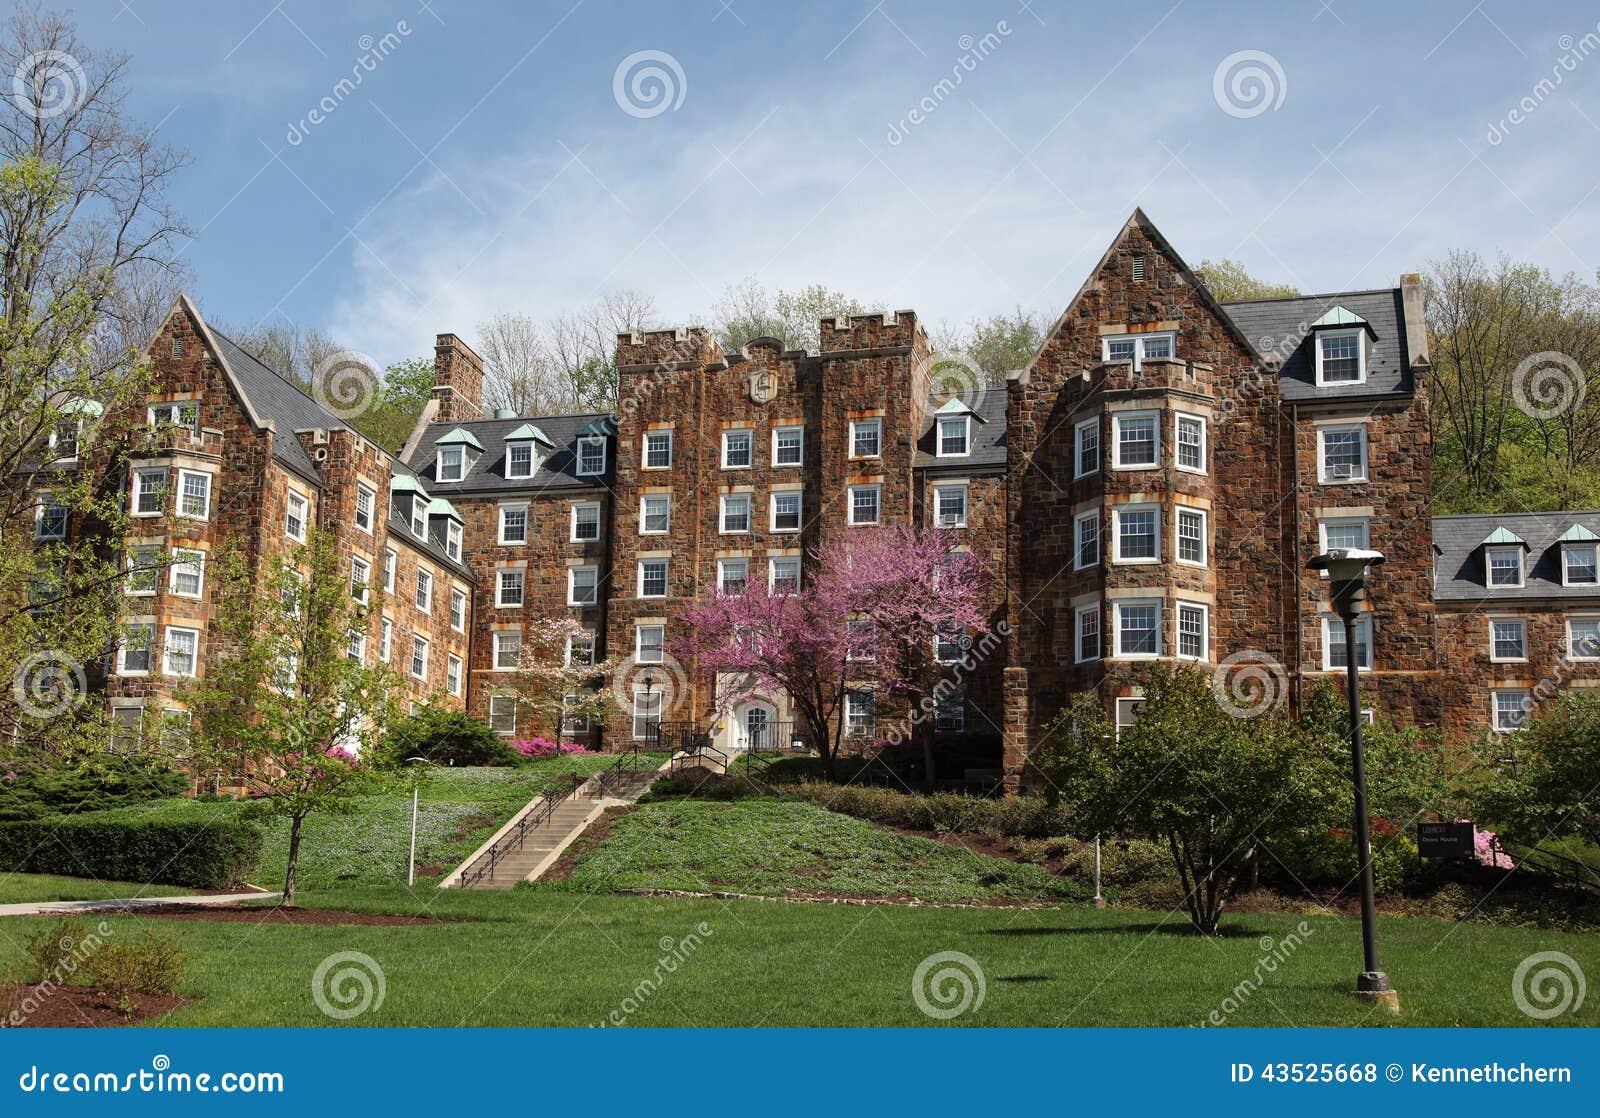 Lehigh University Editorial Stock Photo - Image: 43525668